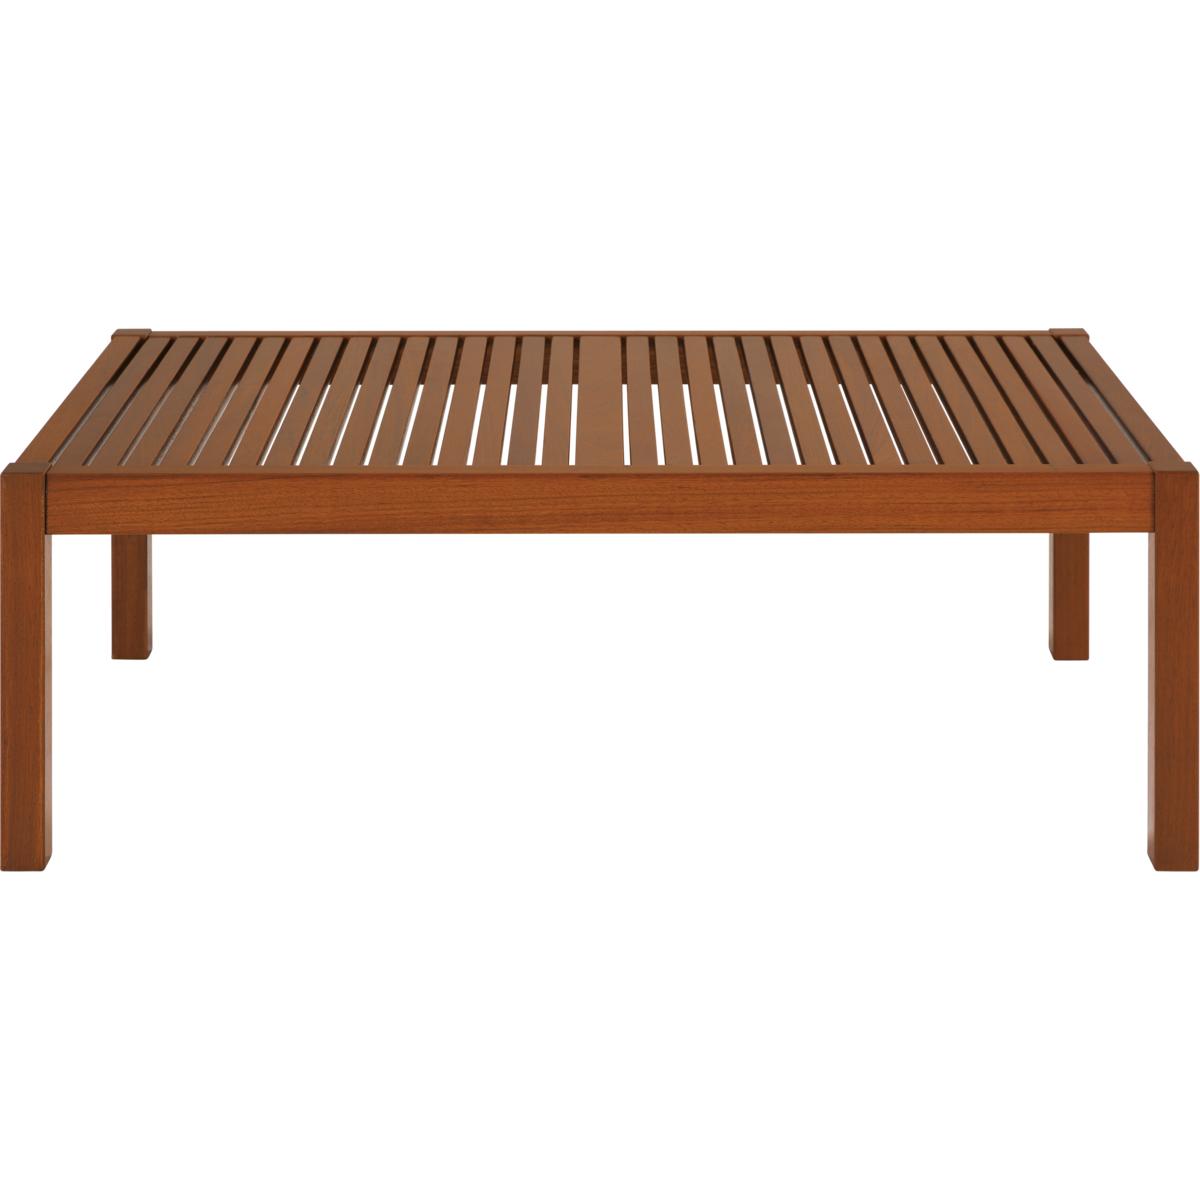 Tramontina Big Coffee Table With Jatob Wood And Eco